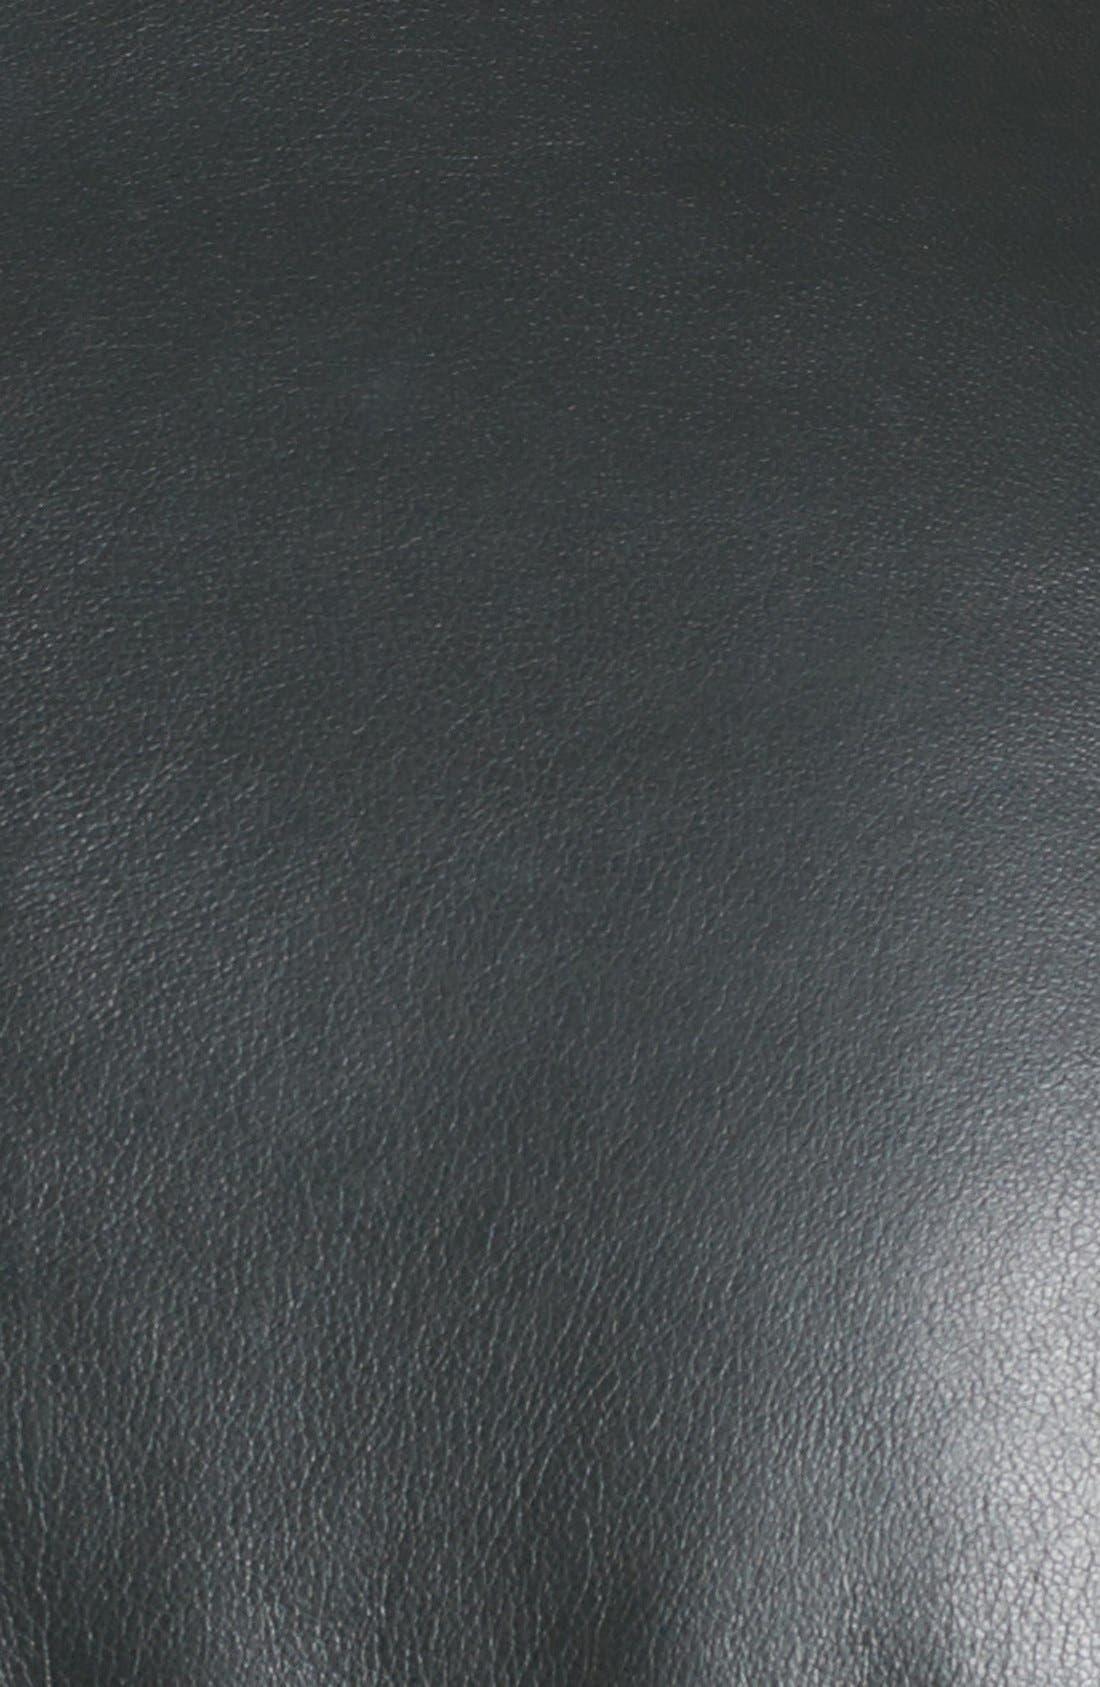 Alternate Image 3  - KENZO Quilted Leather Bomber Jacket